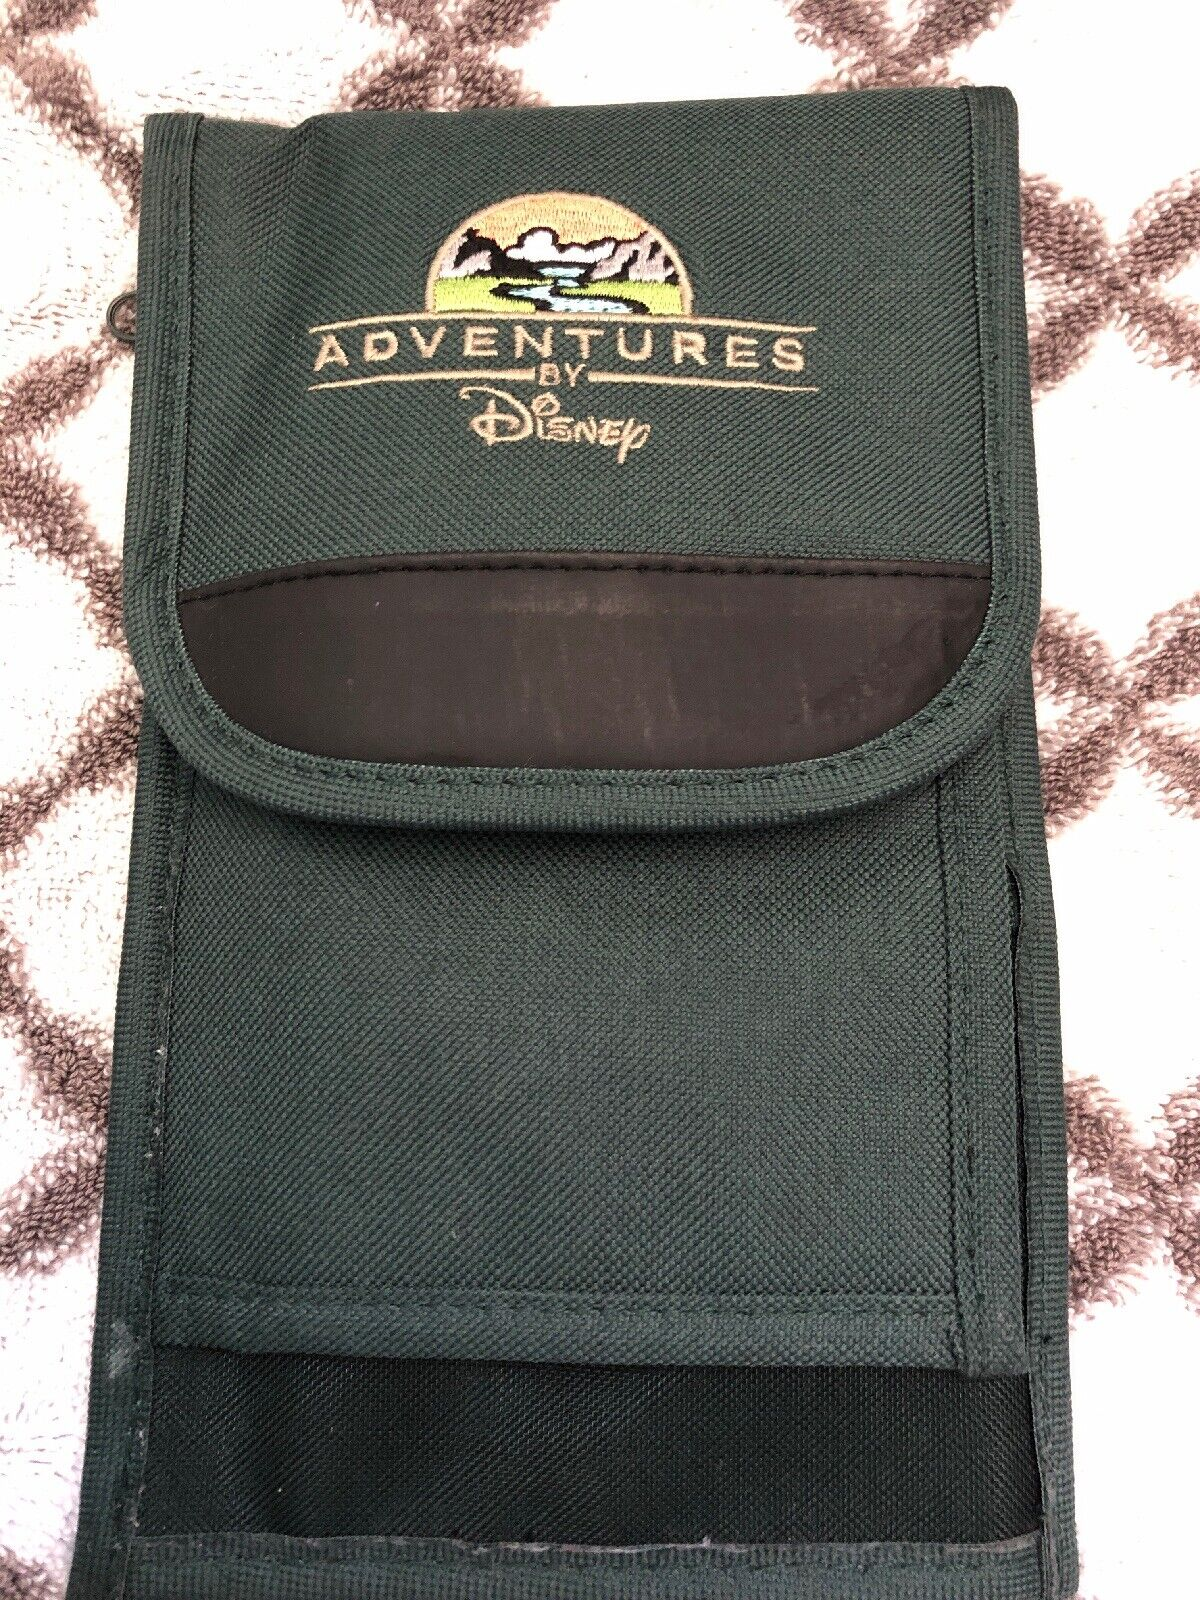 Adventures by Disney Embroidered Wallet Pouch PassportTravel Case Organizer Used